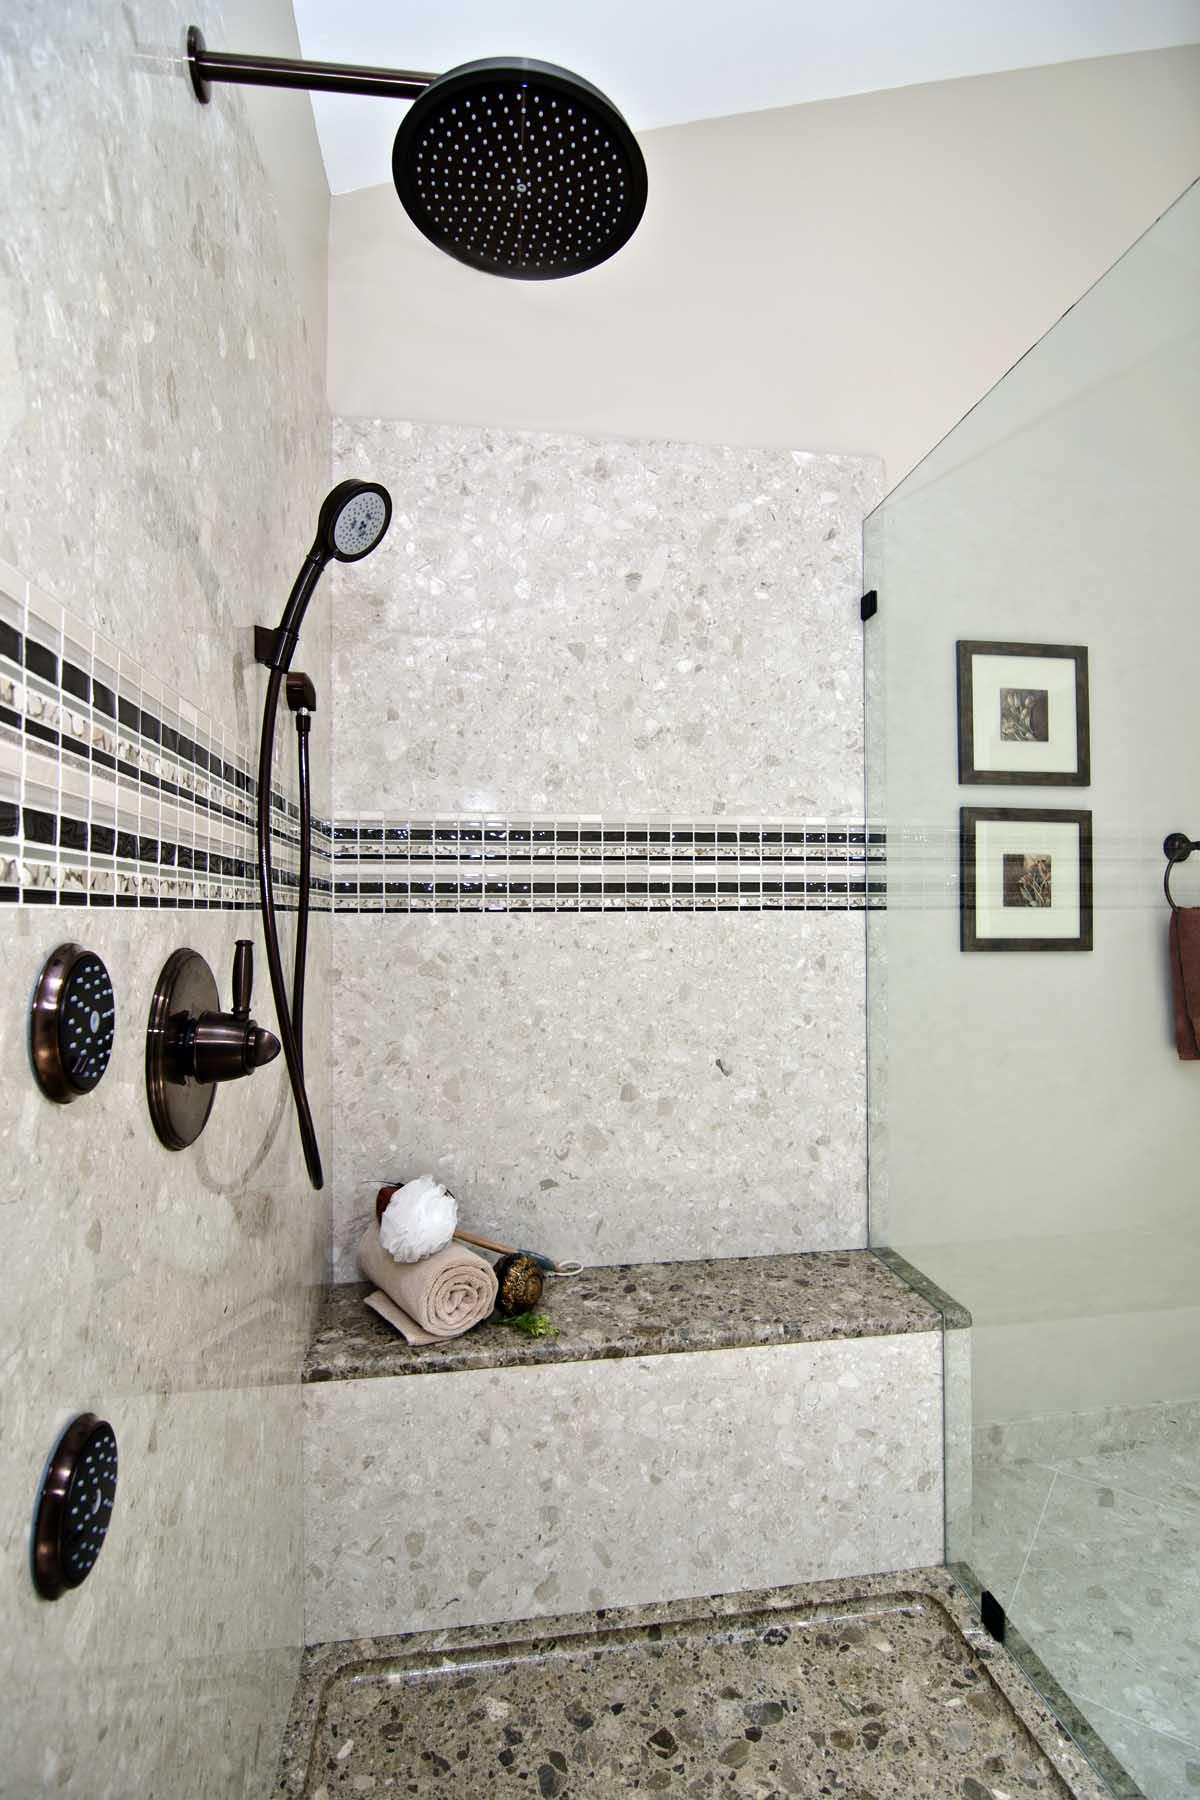 Verona shower walls in Perlato Royal